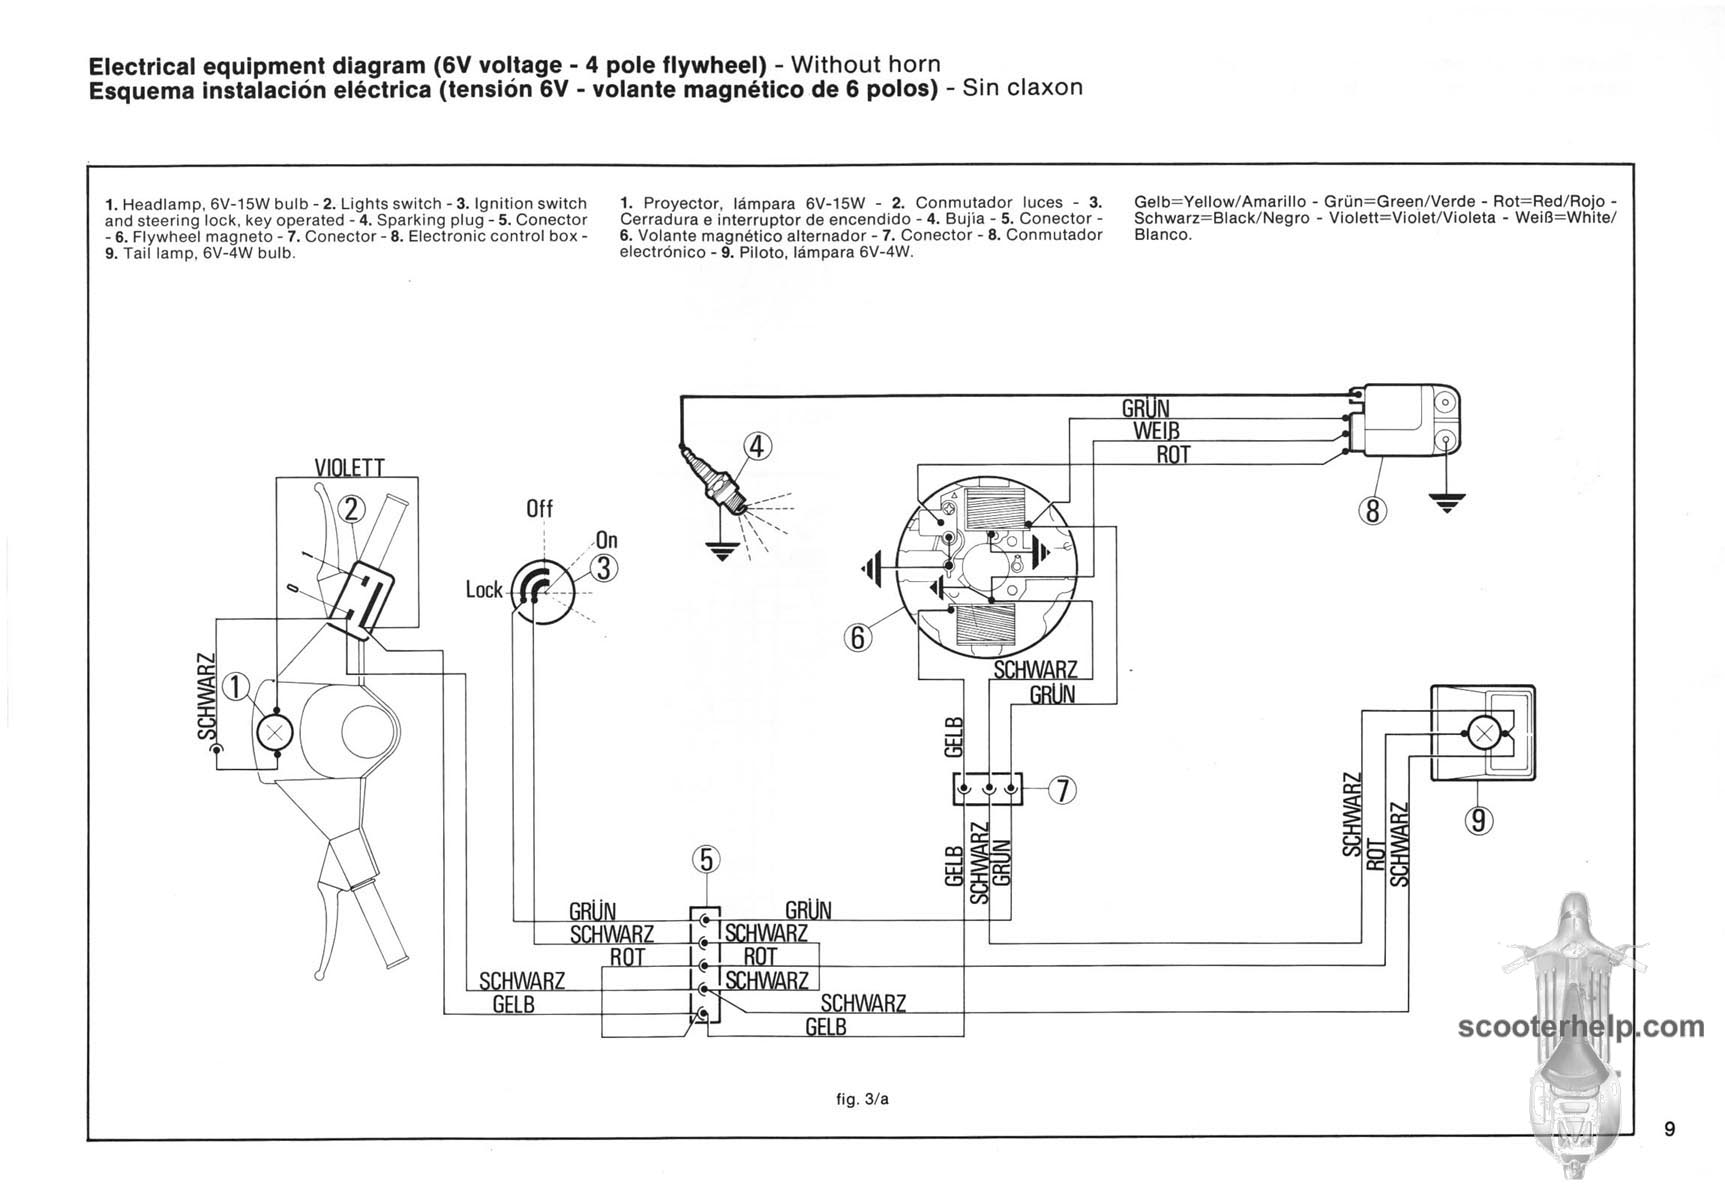 index of manuals pk service manual rh scooterhelp com piaggio ape 50 workshop manual piaggio ape 50 service manual pdf